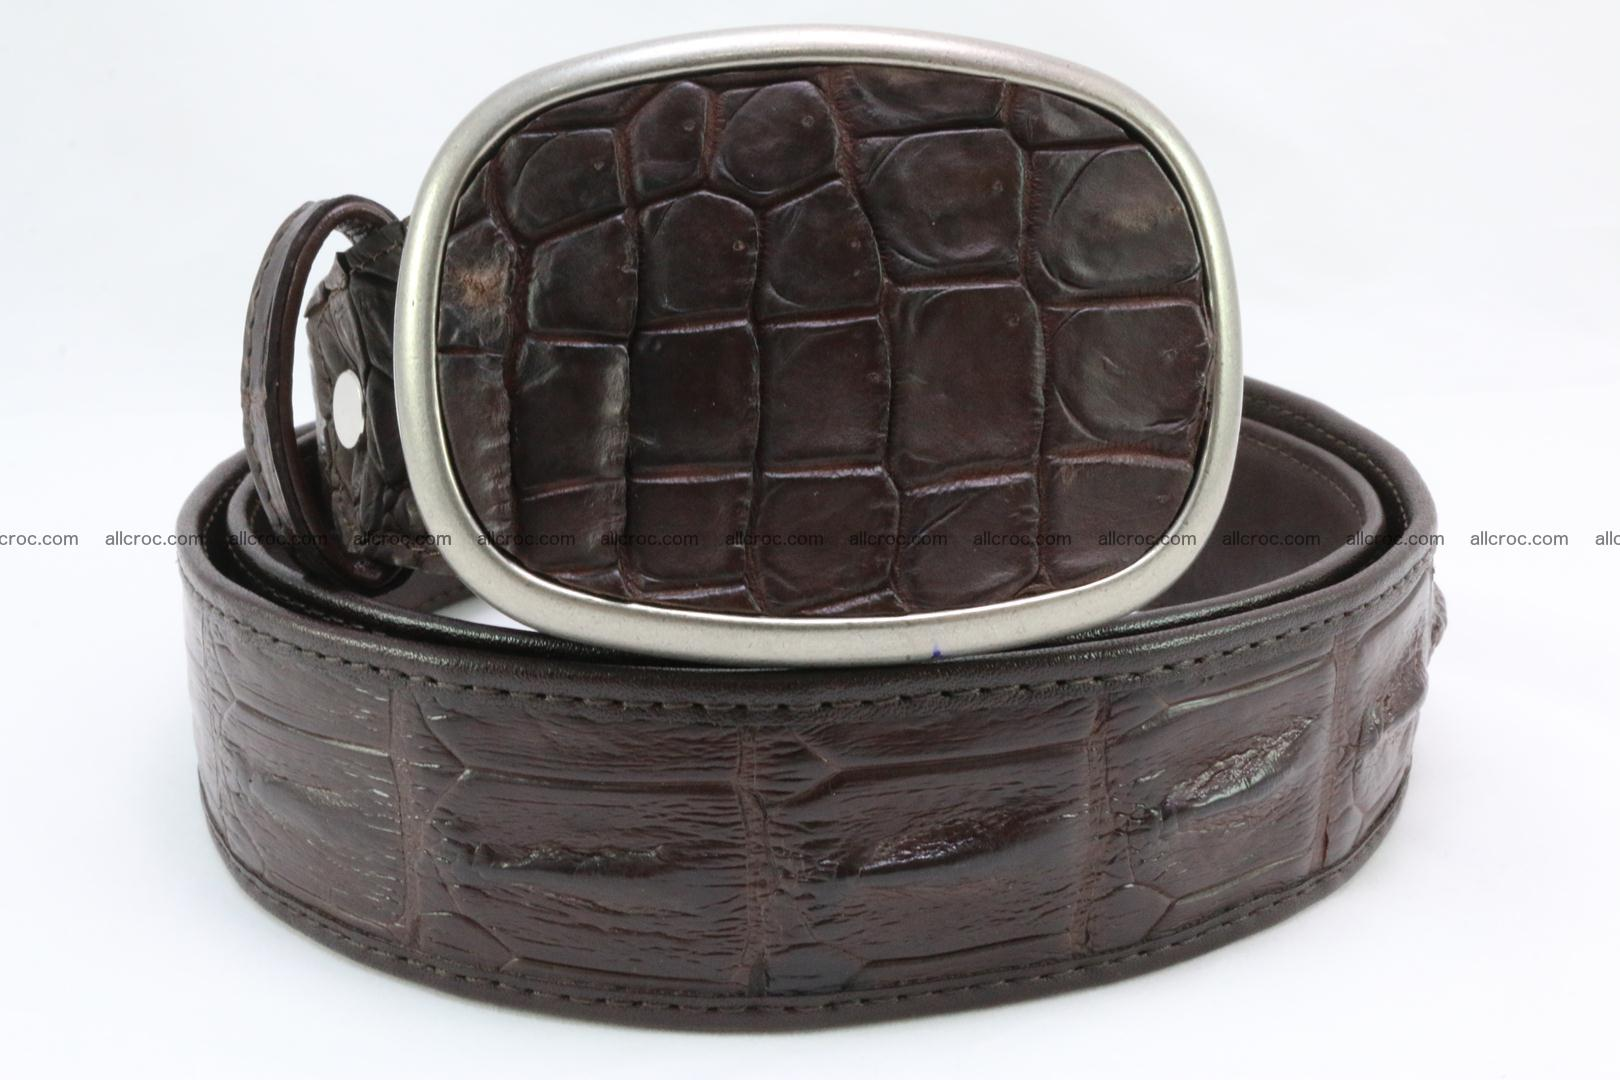 Genuine crocodile leather hornback belt 097 Foto 1